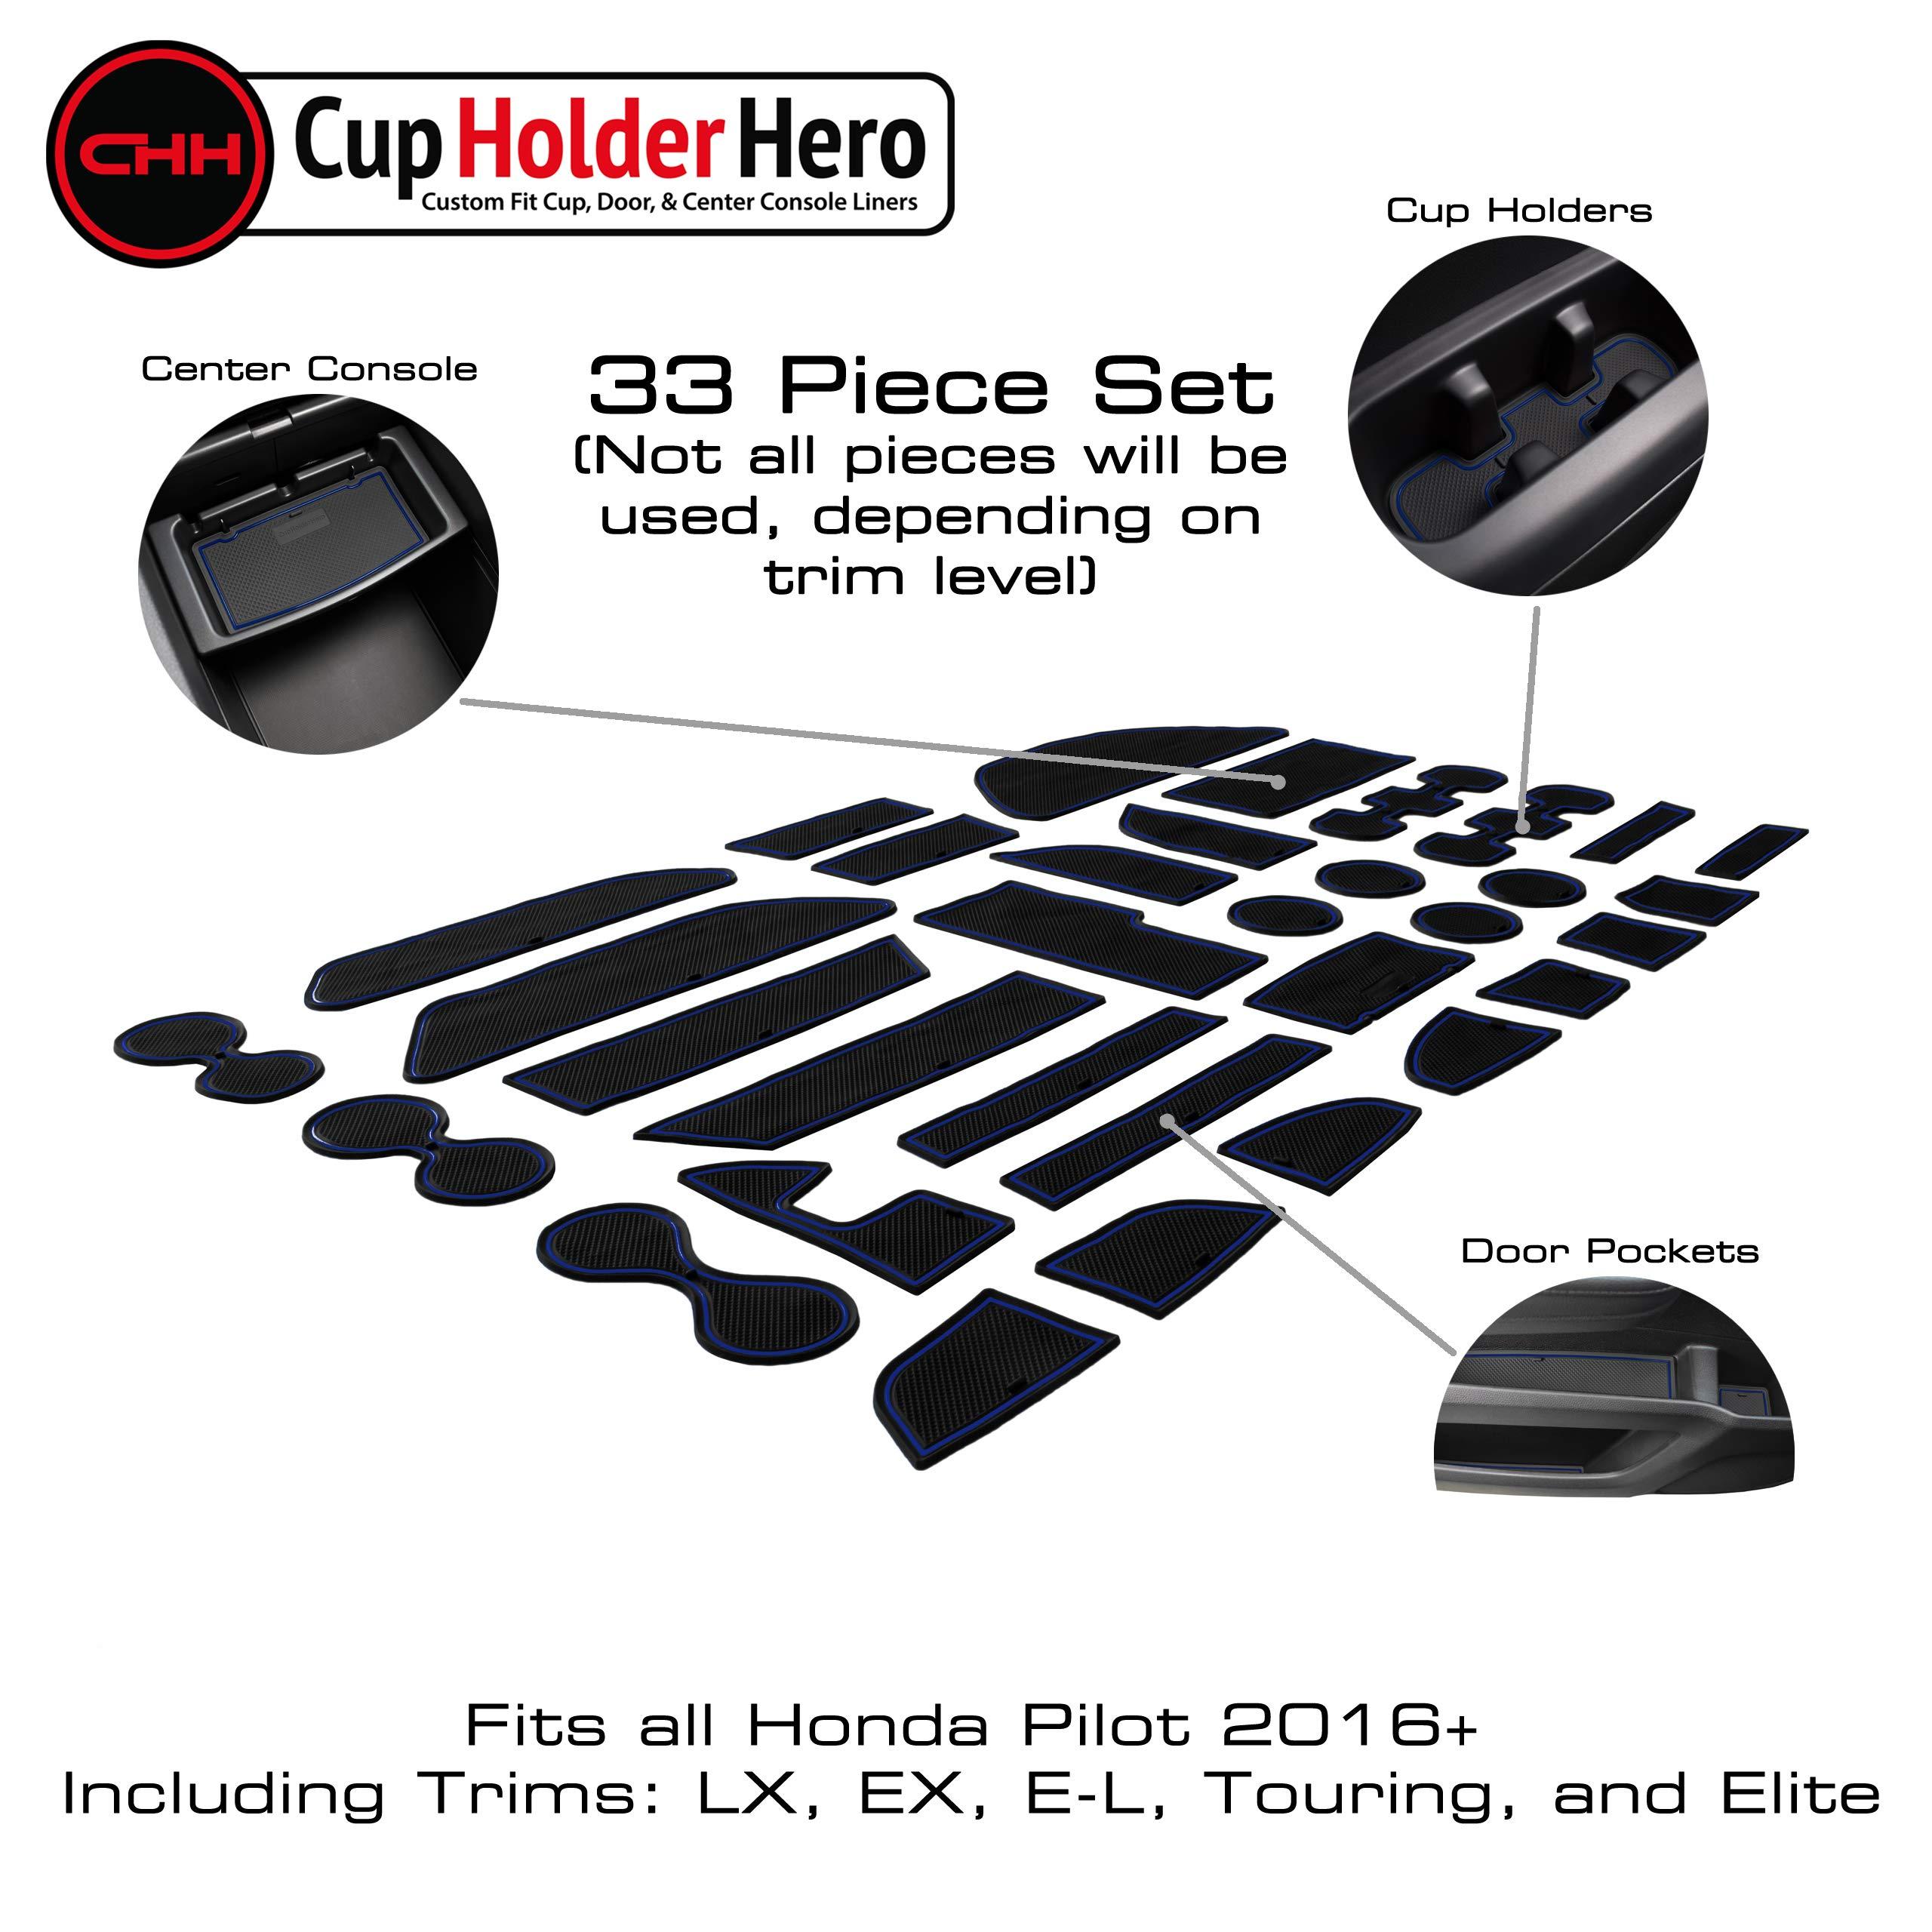 Blue Trim SENSHINE for Honda CR-V CRV Accessories 2020 2021 Cup Holder Insert Center Console Liner Trim Door Packet Mats 20PC Set